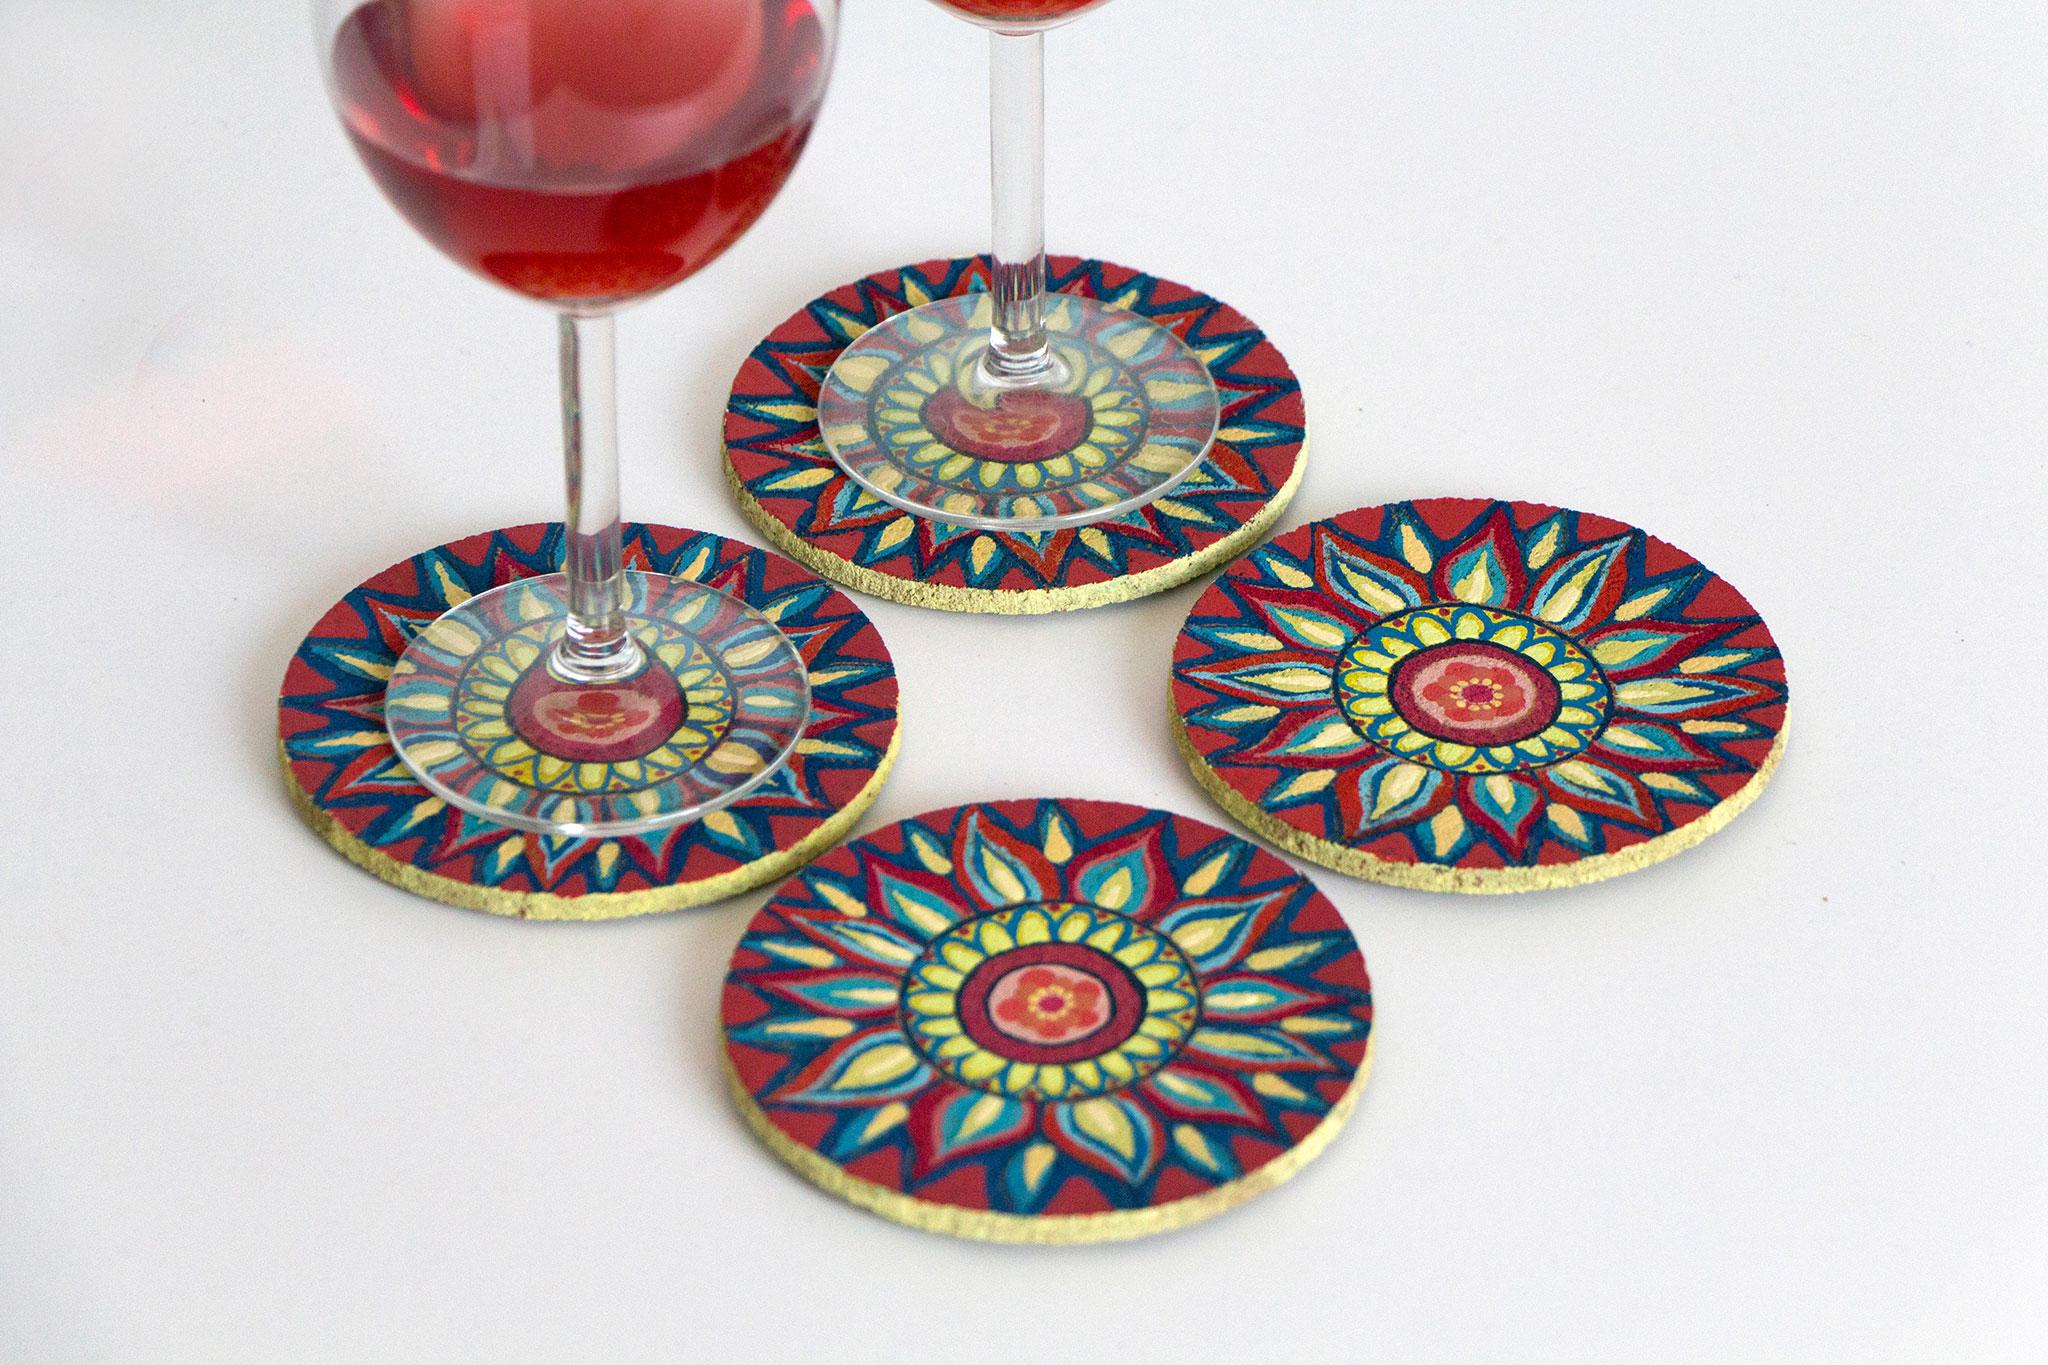 Kork Untersetzer im Mandala-Stil Rot-Gelb (4er-Set)